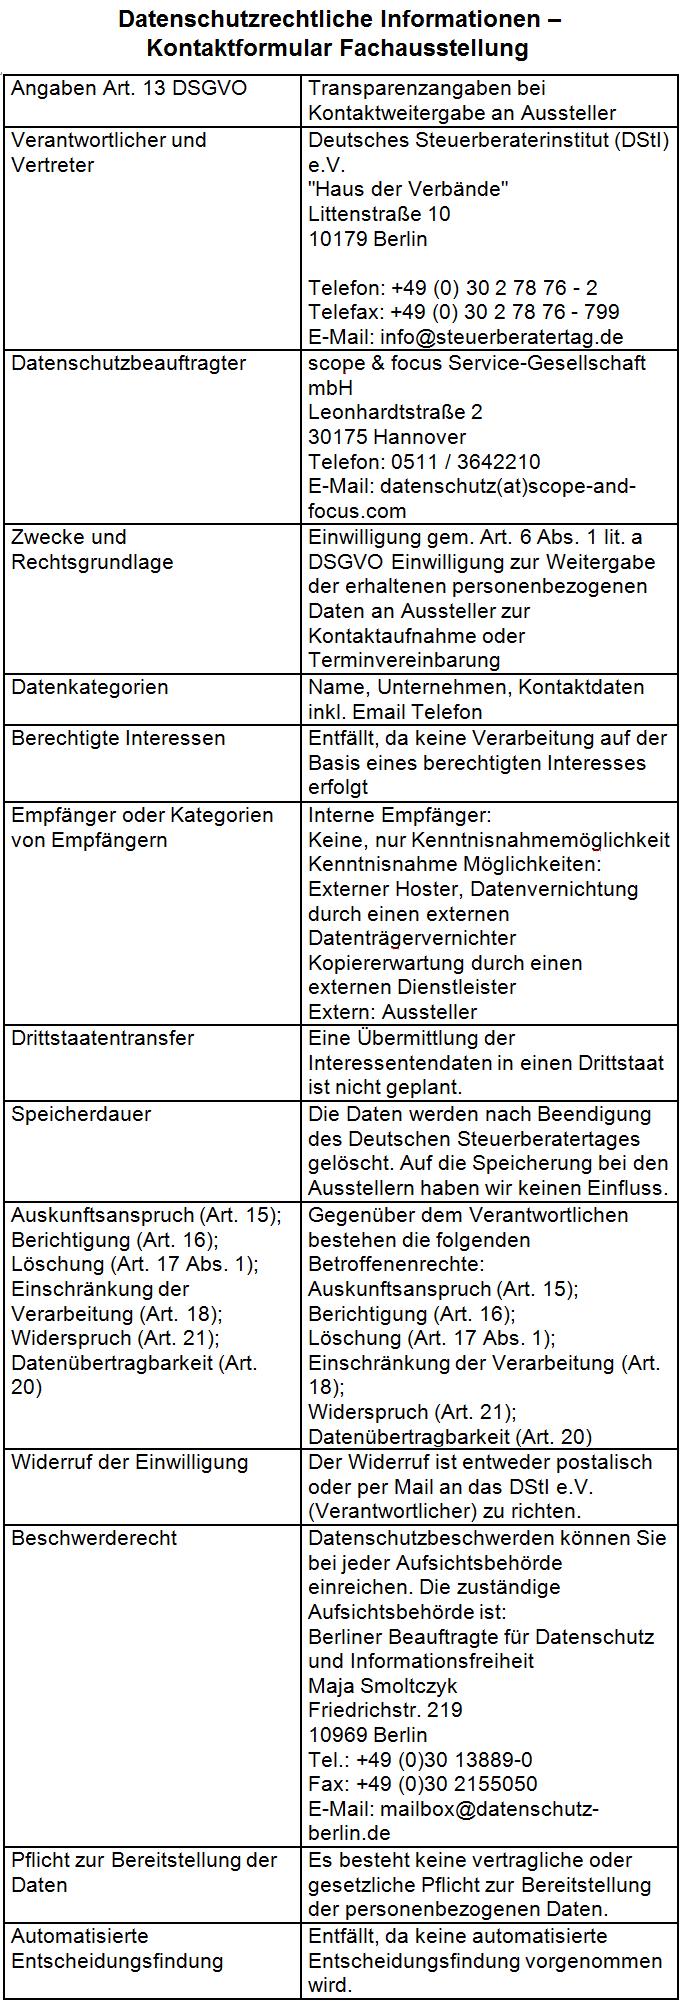 datenschutz Kontaktformular.png